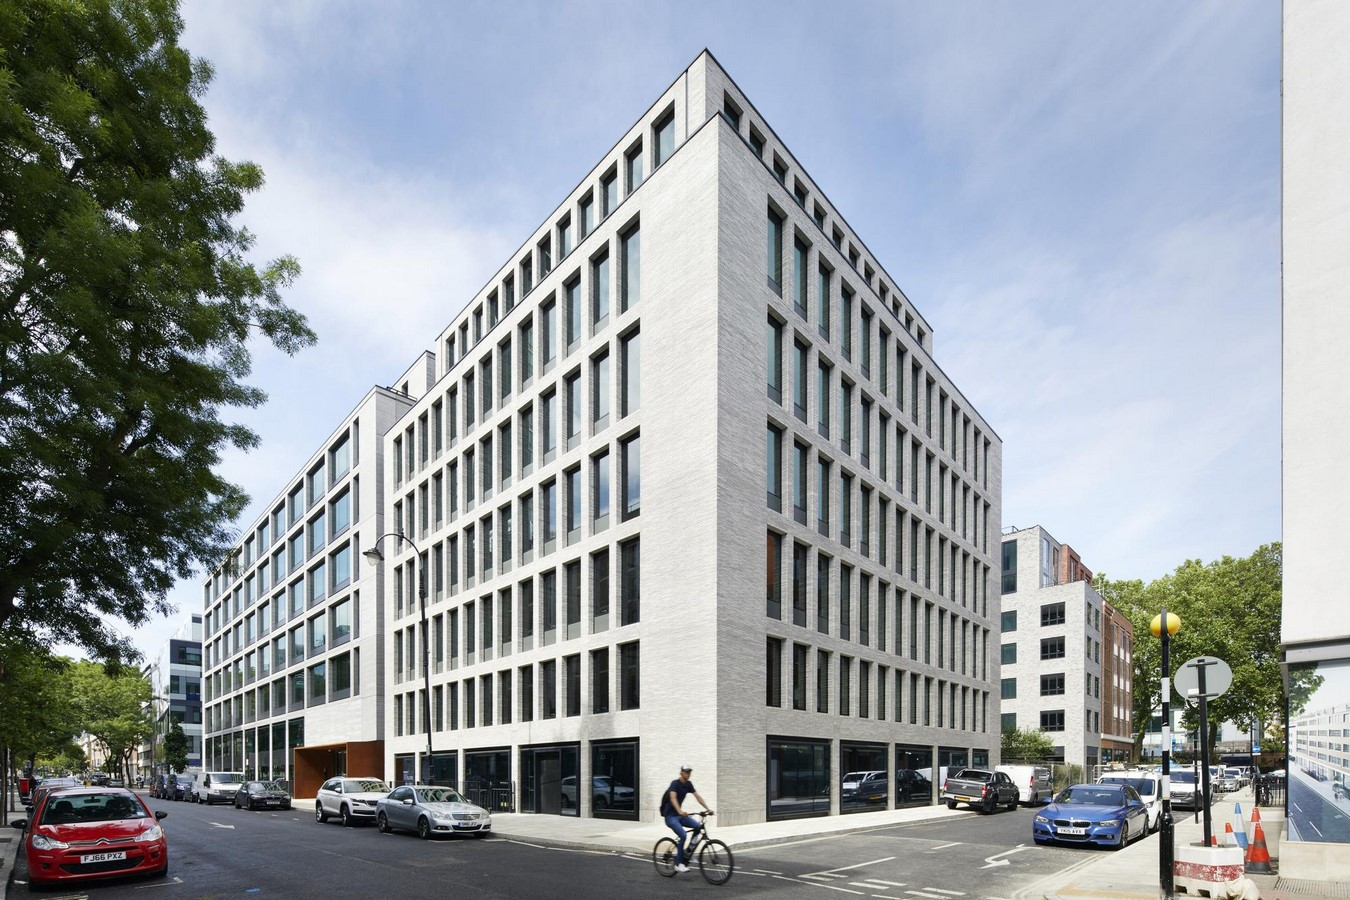 Mixed-Use Buildings - Sheet1